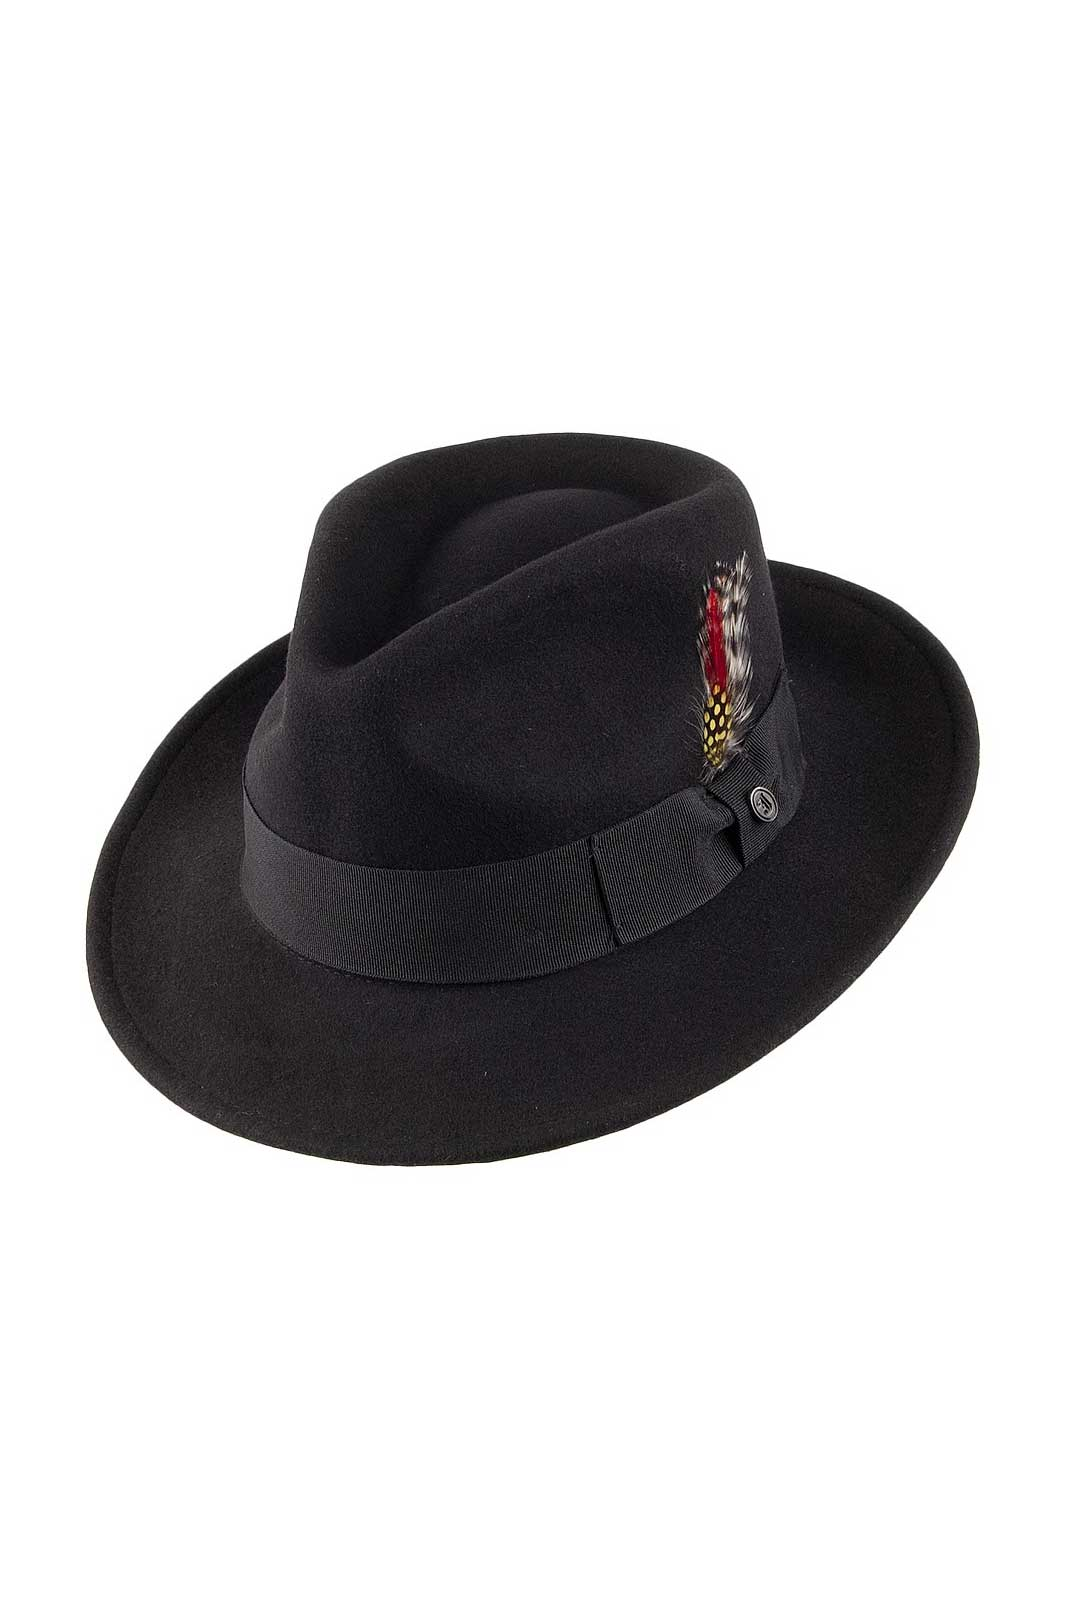 Cruschable C-Crown Fedora Wool Black